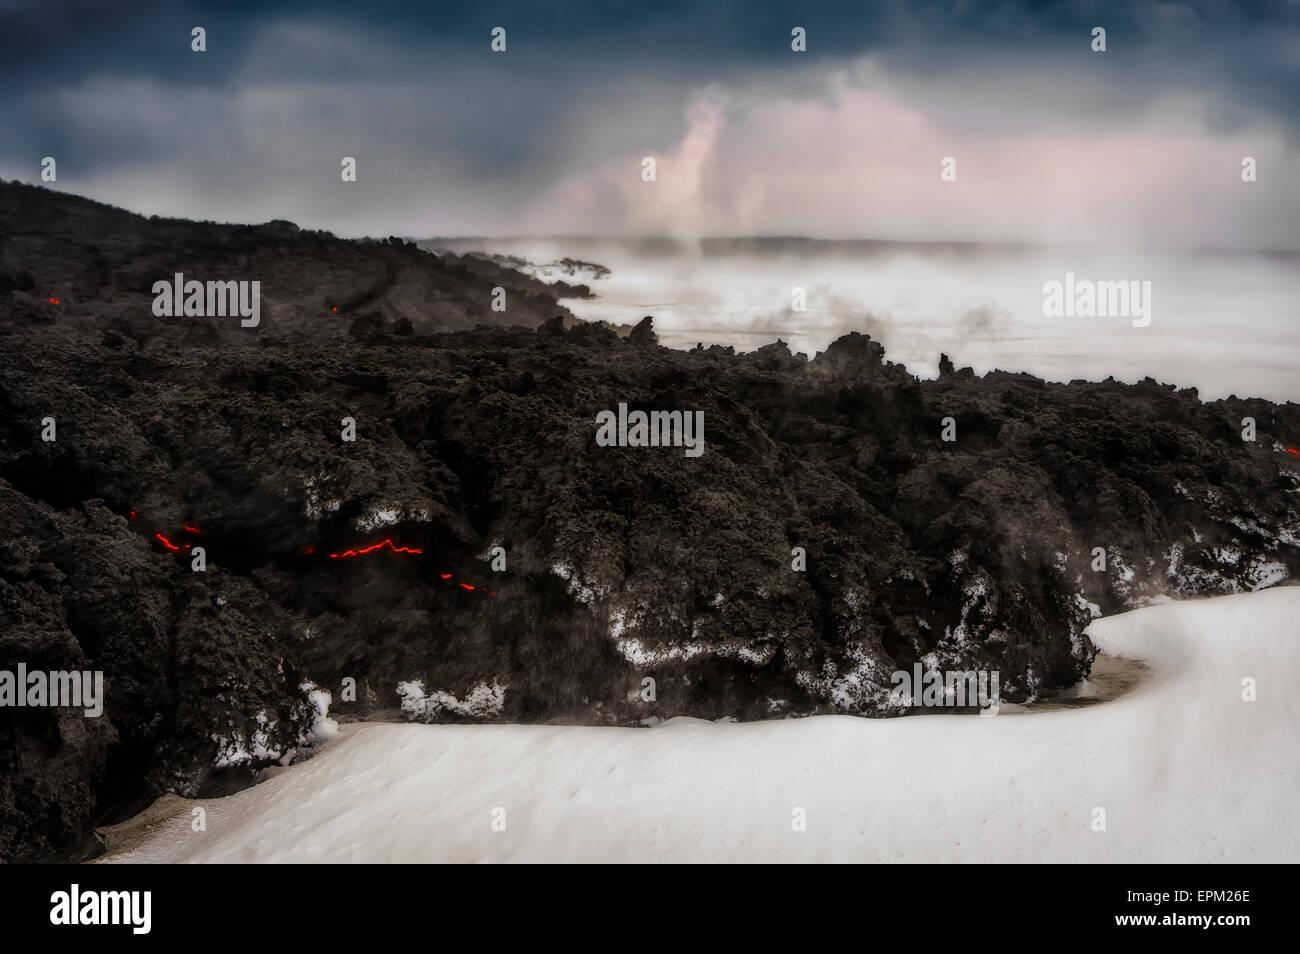 Lava flow and snow, Holuhraun Fissure Eruption, Bardarbunga Volcano, Iceland - Stock Image